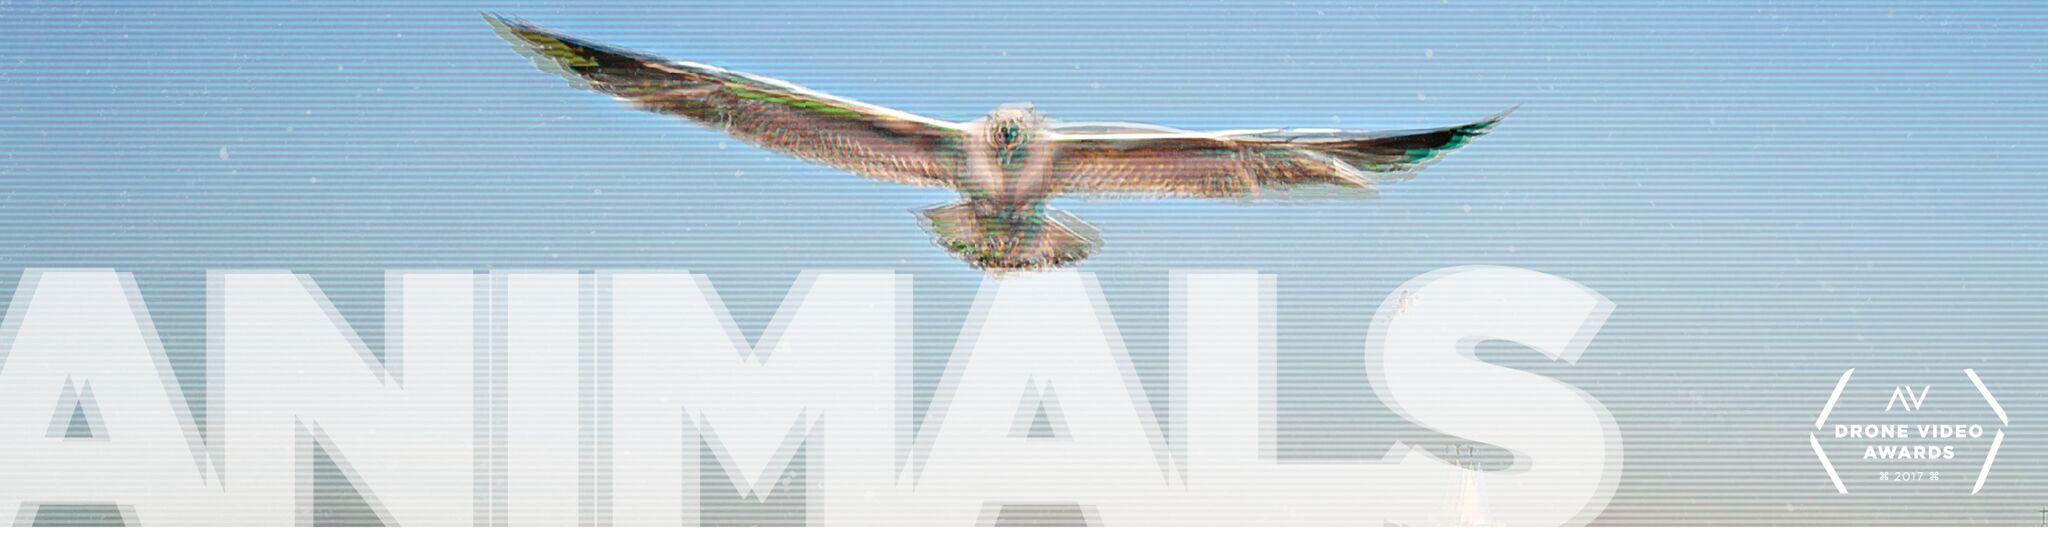 AirVūz Drone Video Awards: Animals